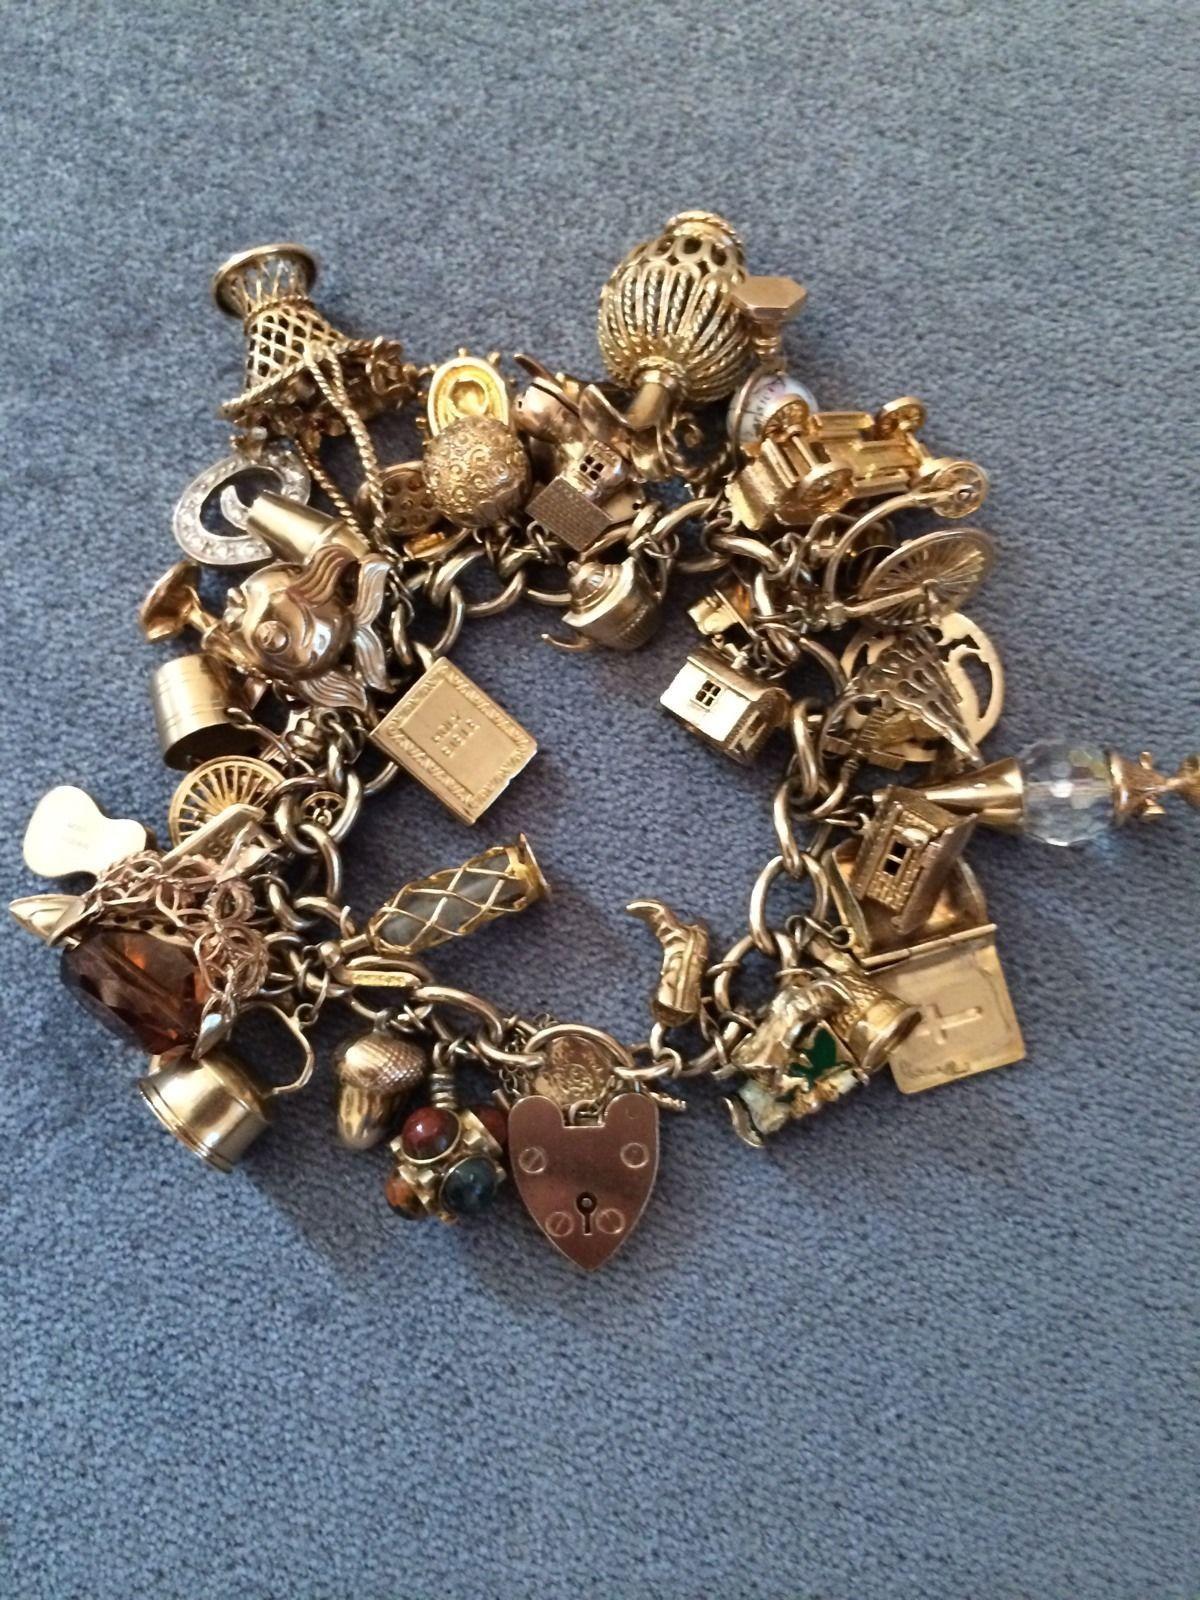 Gold Charm Bracelet Ebay